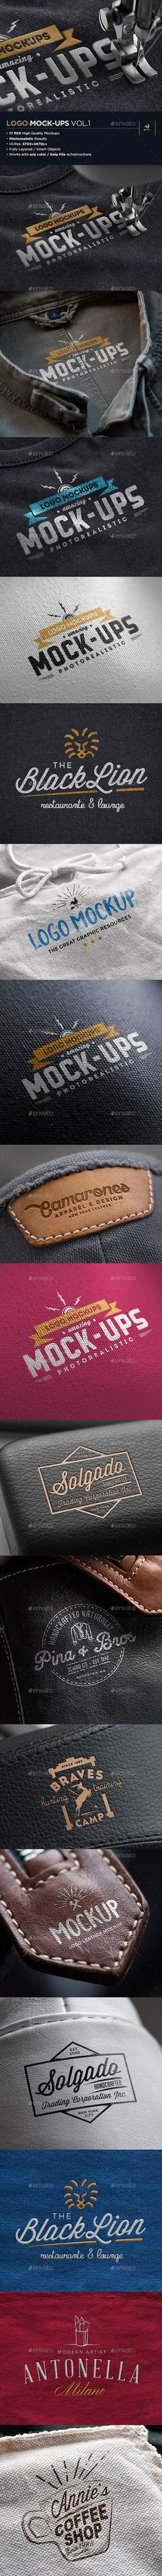 #LogoMock-Ups / Vol.1 - Logo Product Mock-Ups.